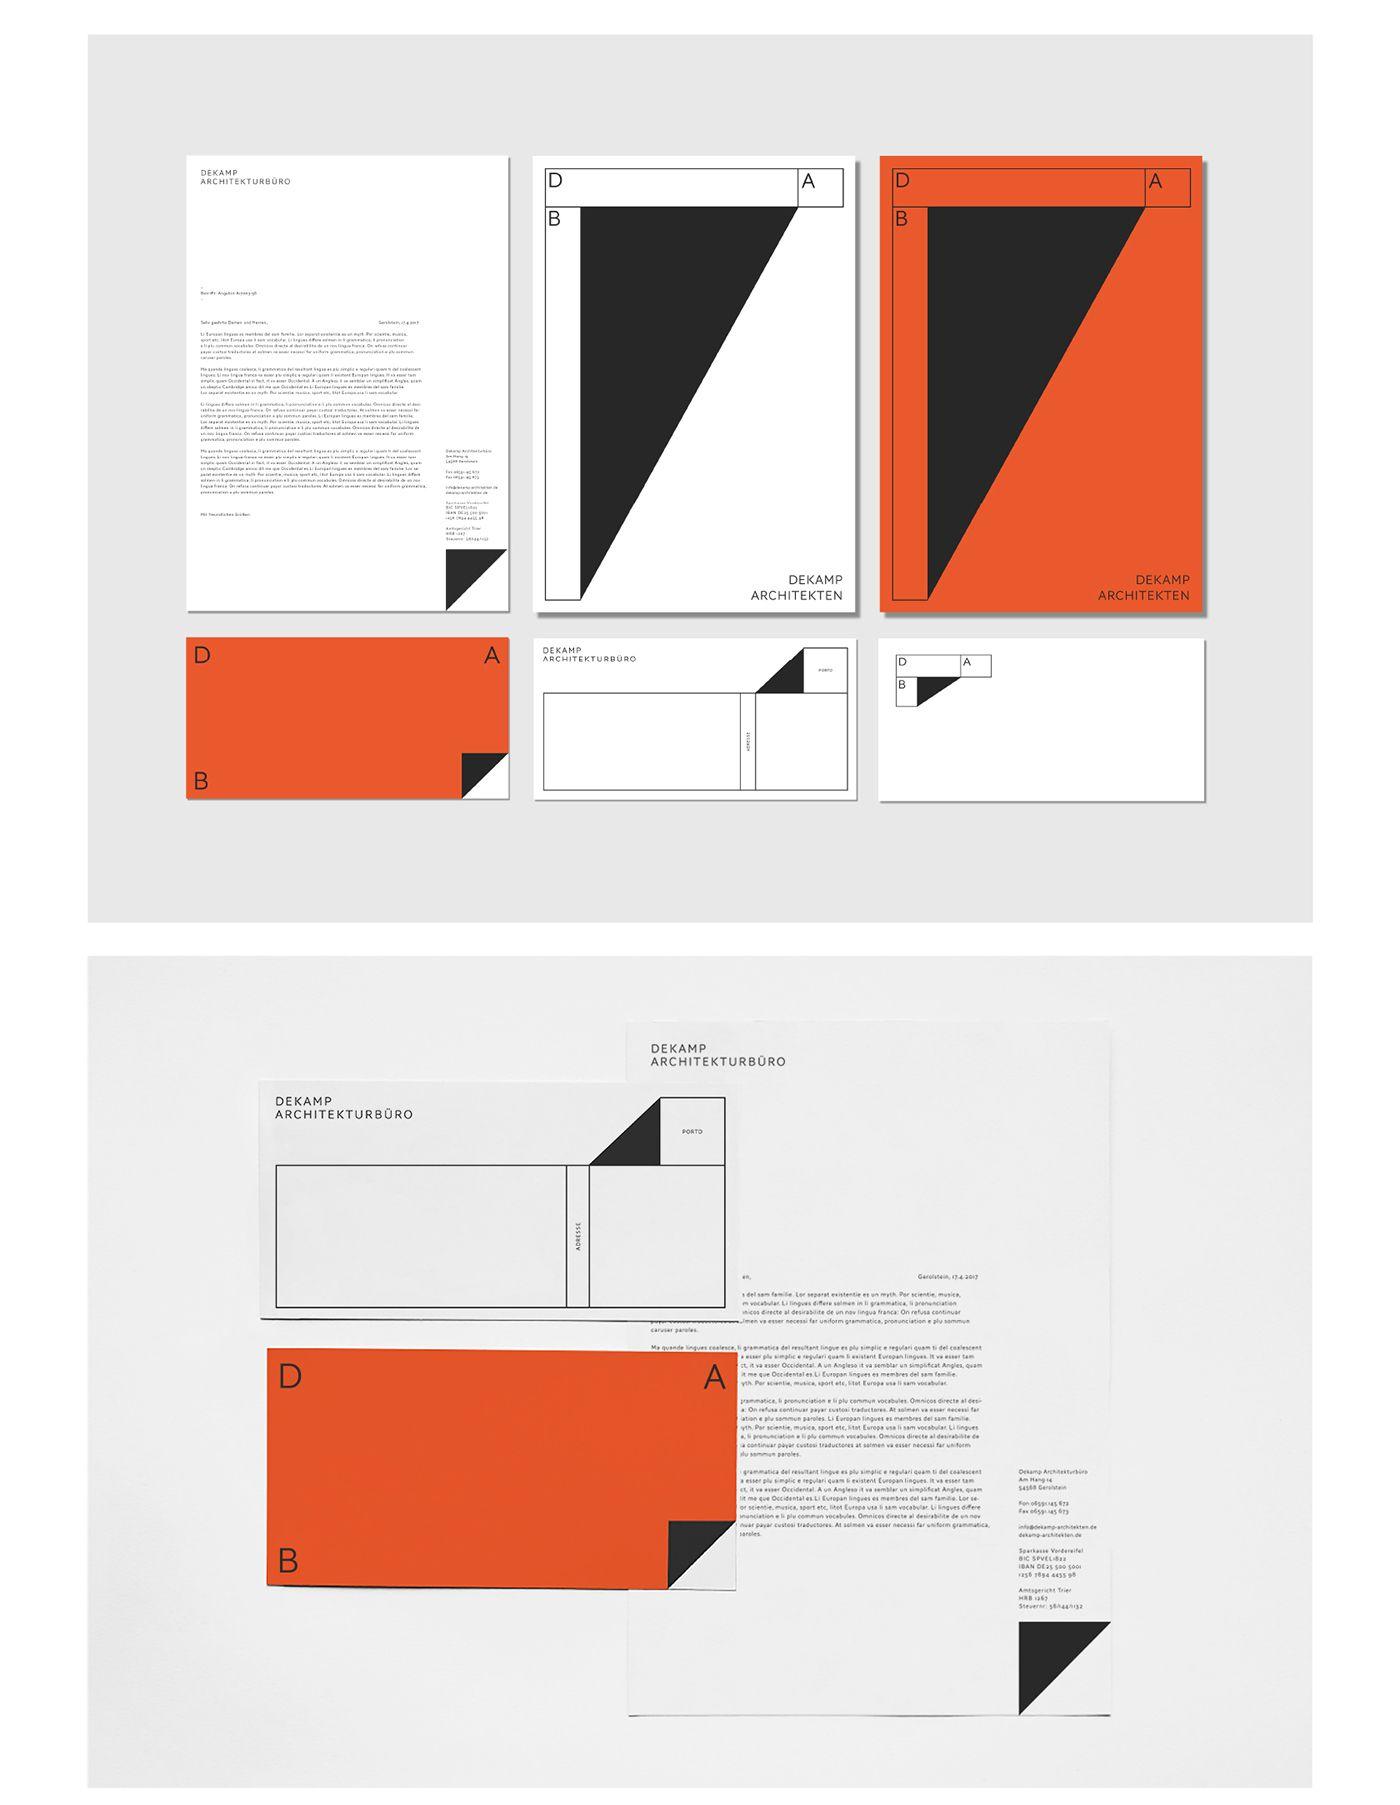 Dekamp Architekten on Behance